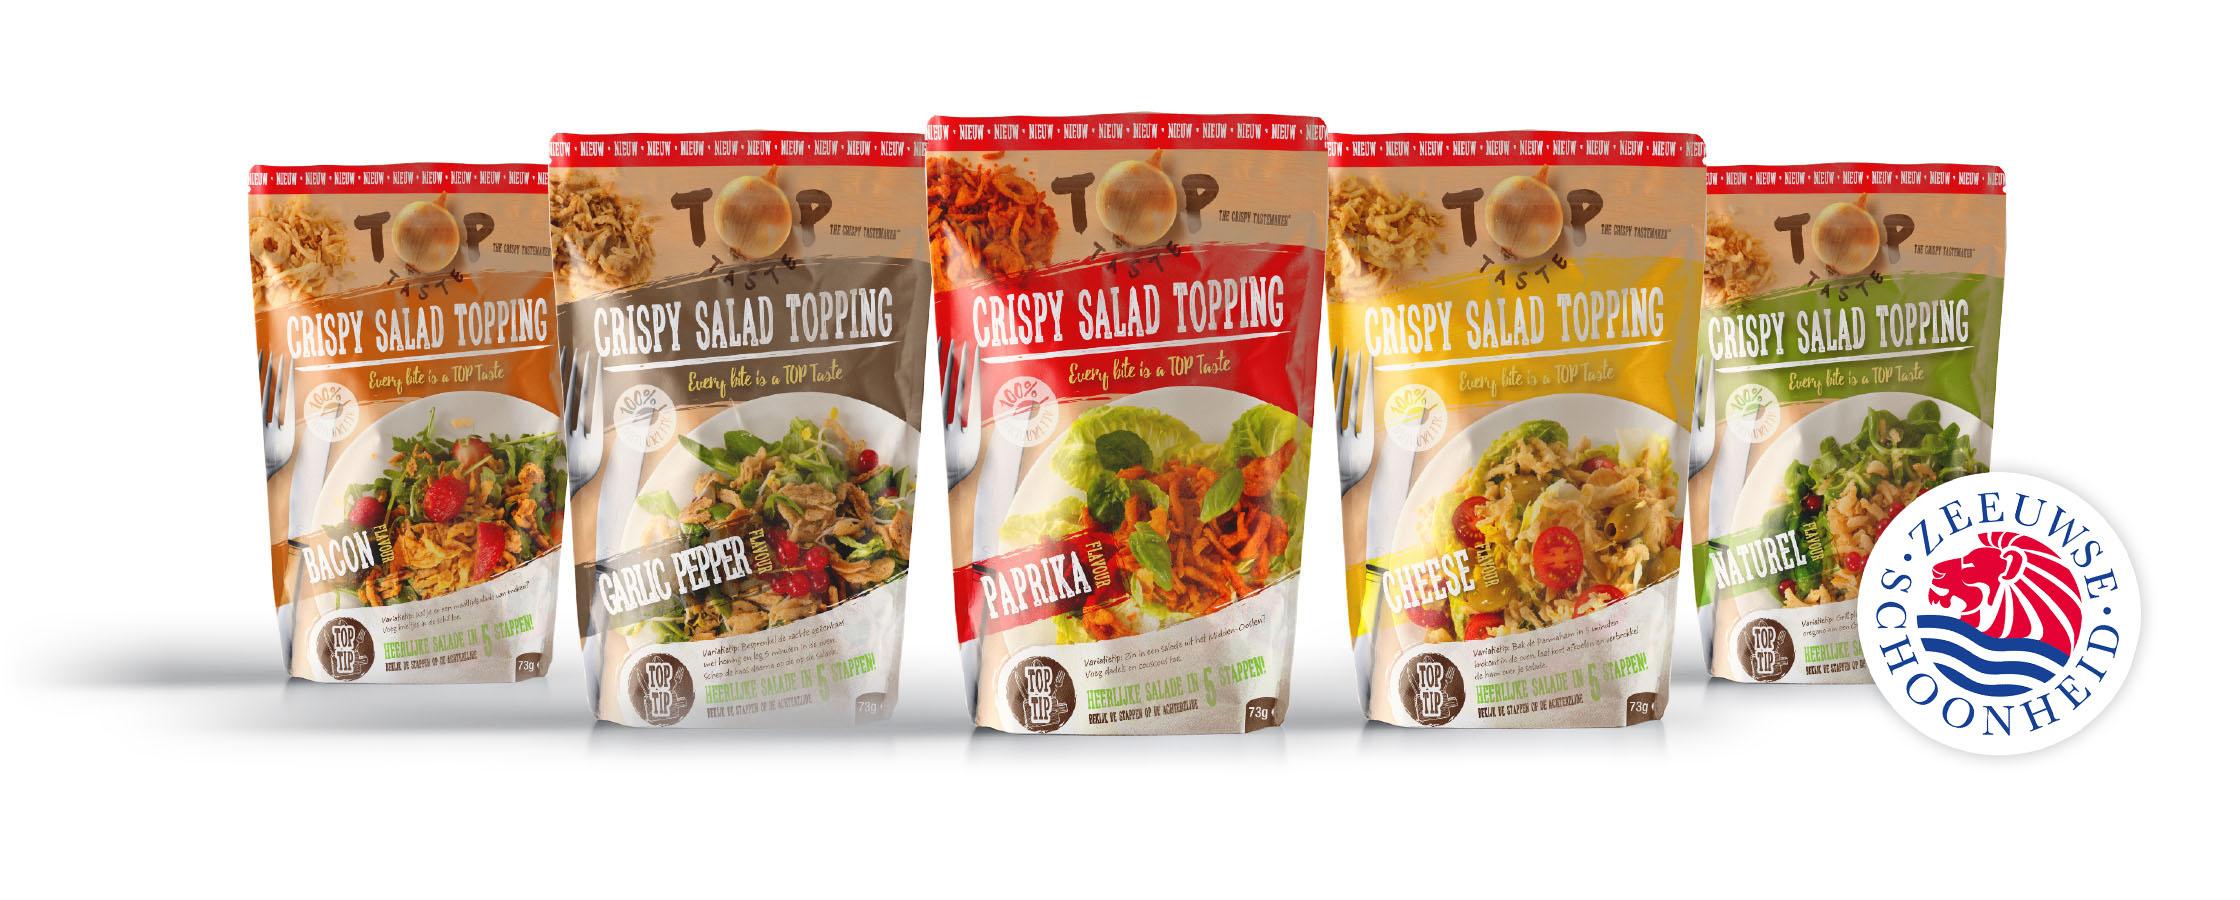 The Crispy Tastemaker • Salad Topping • De 5 smaken